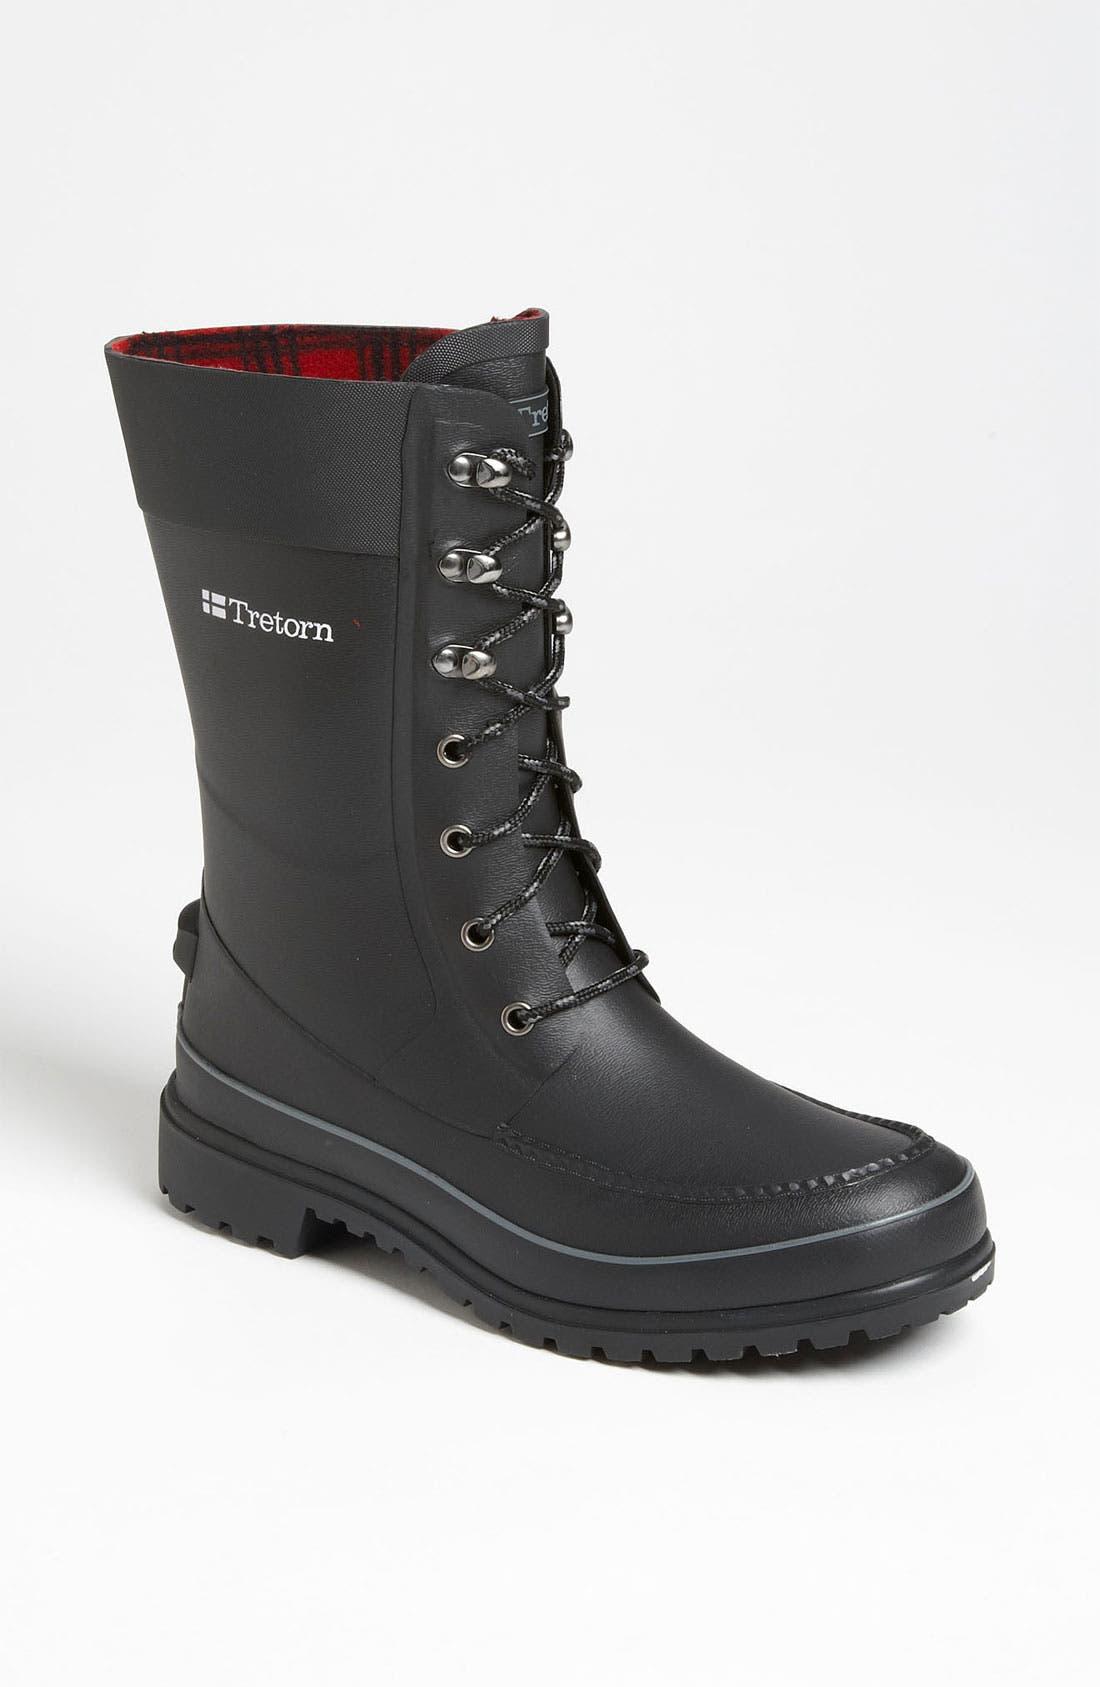 Alternate Image 1 Selected - Tretorn 'Bomanbeck' Snow Boot